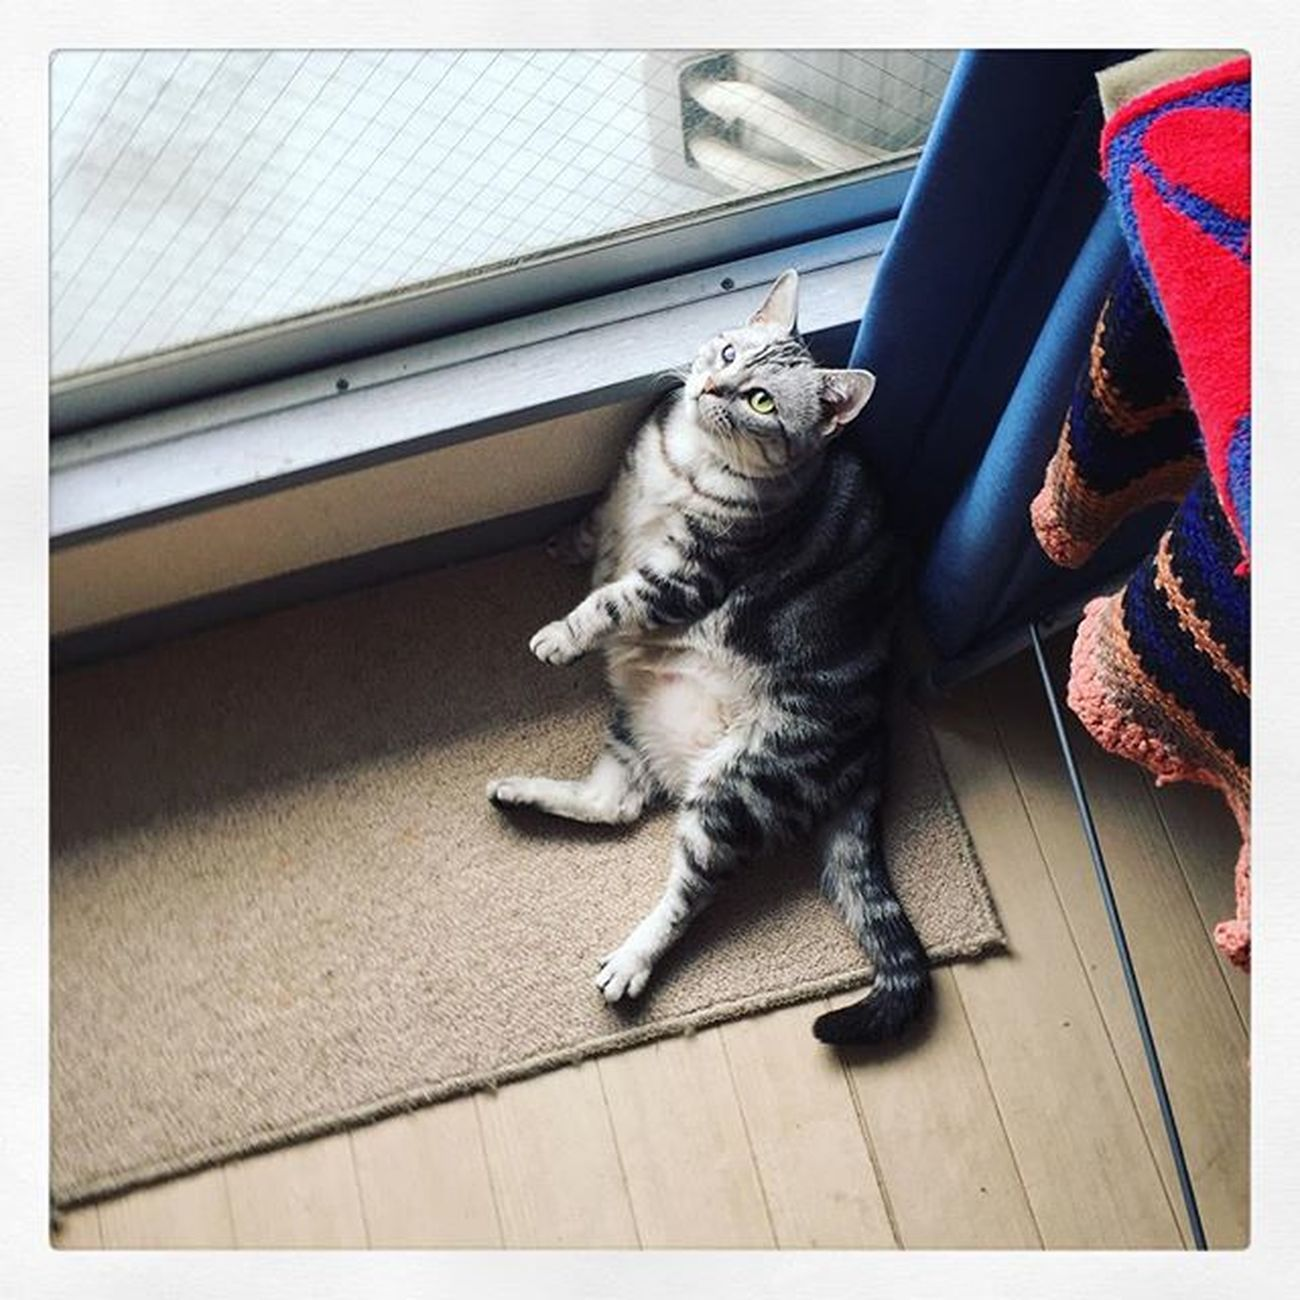 Cat Neko ねこ 猫 ねこ Cats アメリカンショートヘアー アメショ Americanshorthair ズズ ズズ子 Zuzu ズズっぺ シルバータビー そして朝ズズ〜😚😽💕